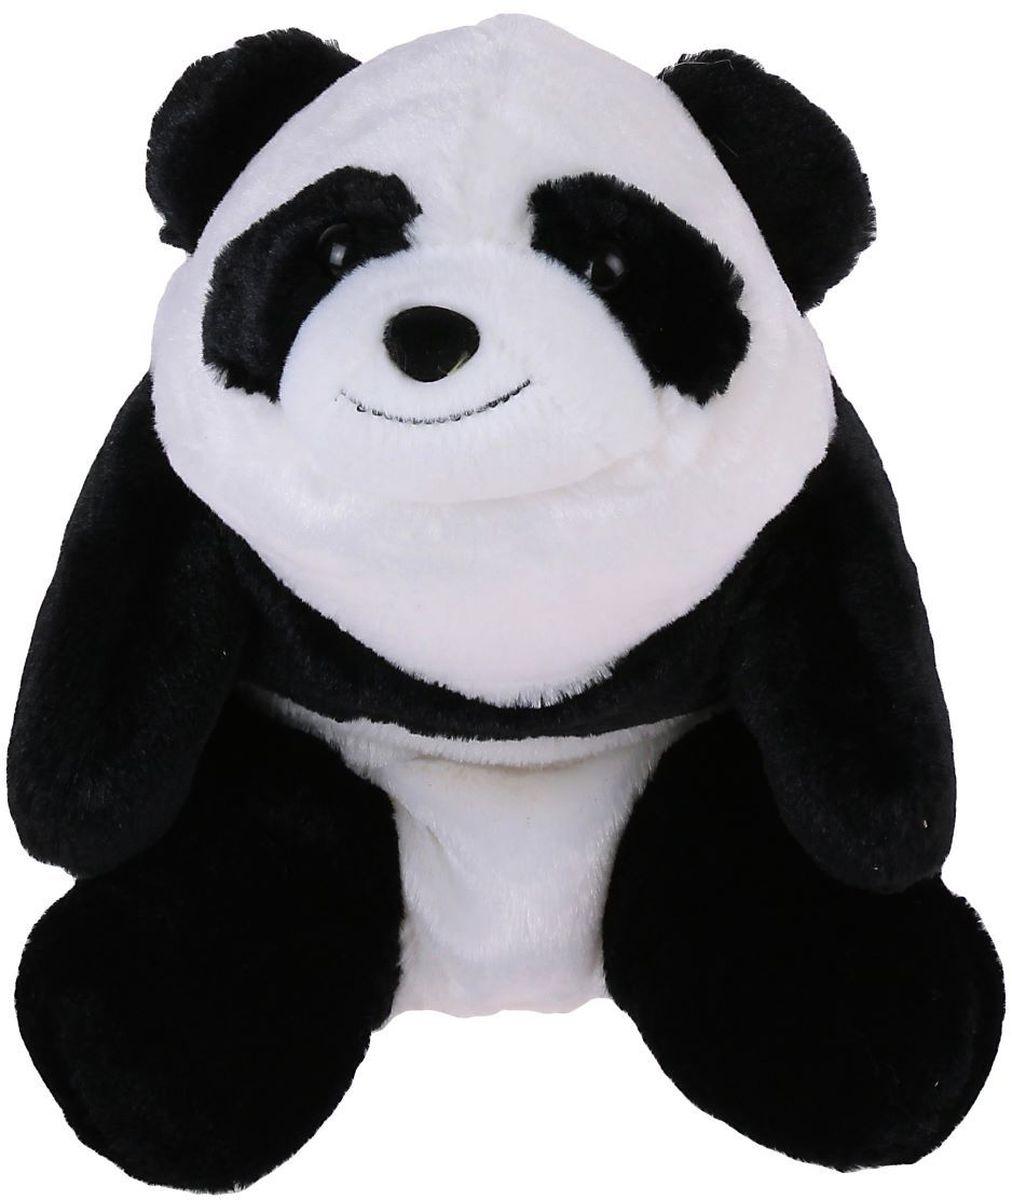 Gund Мягкая игрушка Панда Snuffles 22,5 см 2245539 малышарики мягкая игрушка собака бассет хаунд 23 см